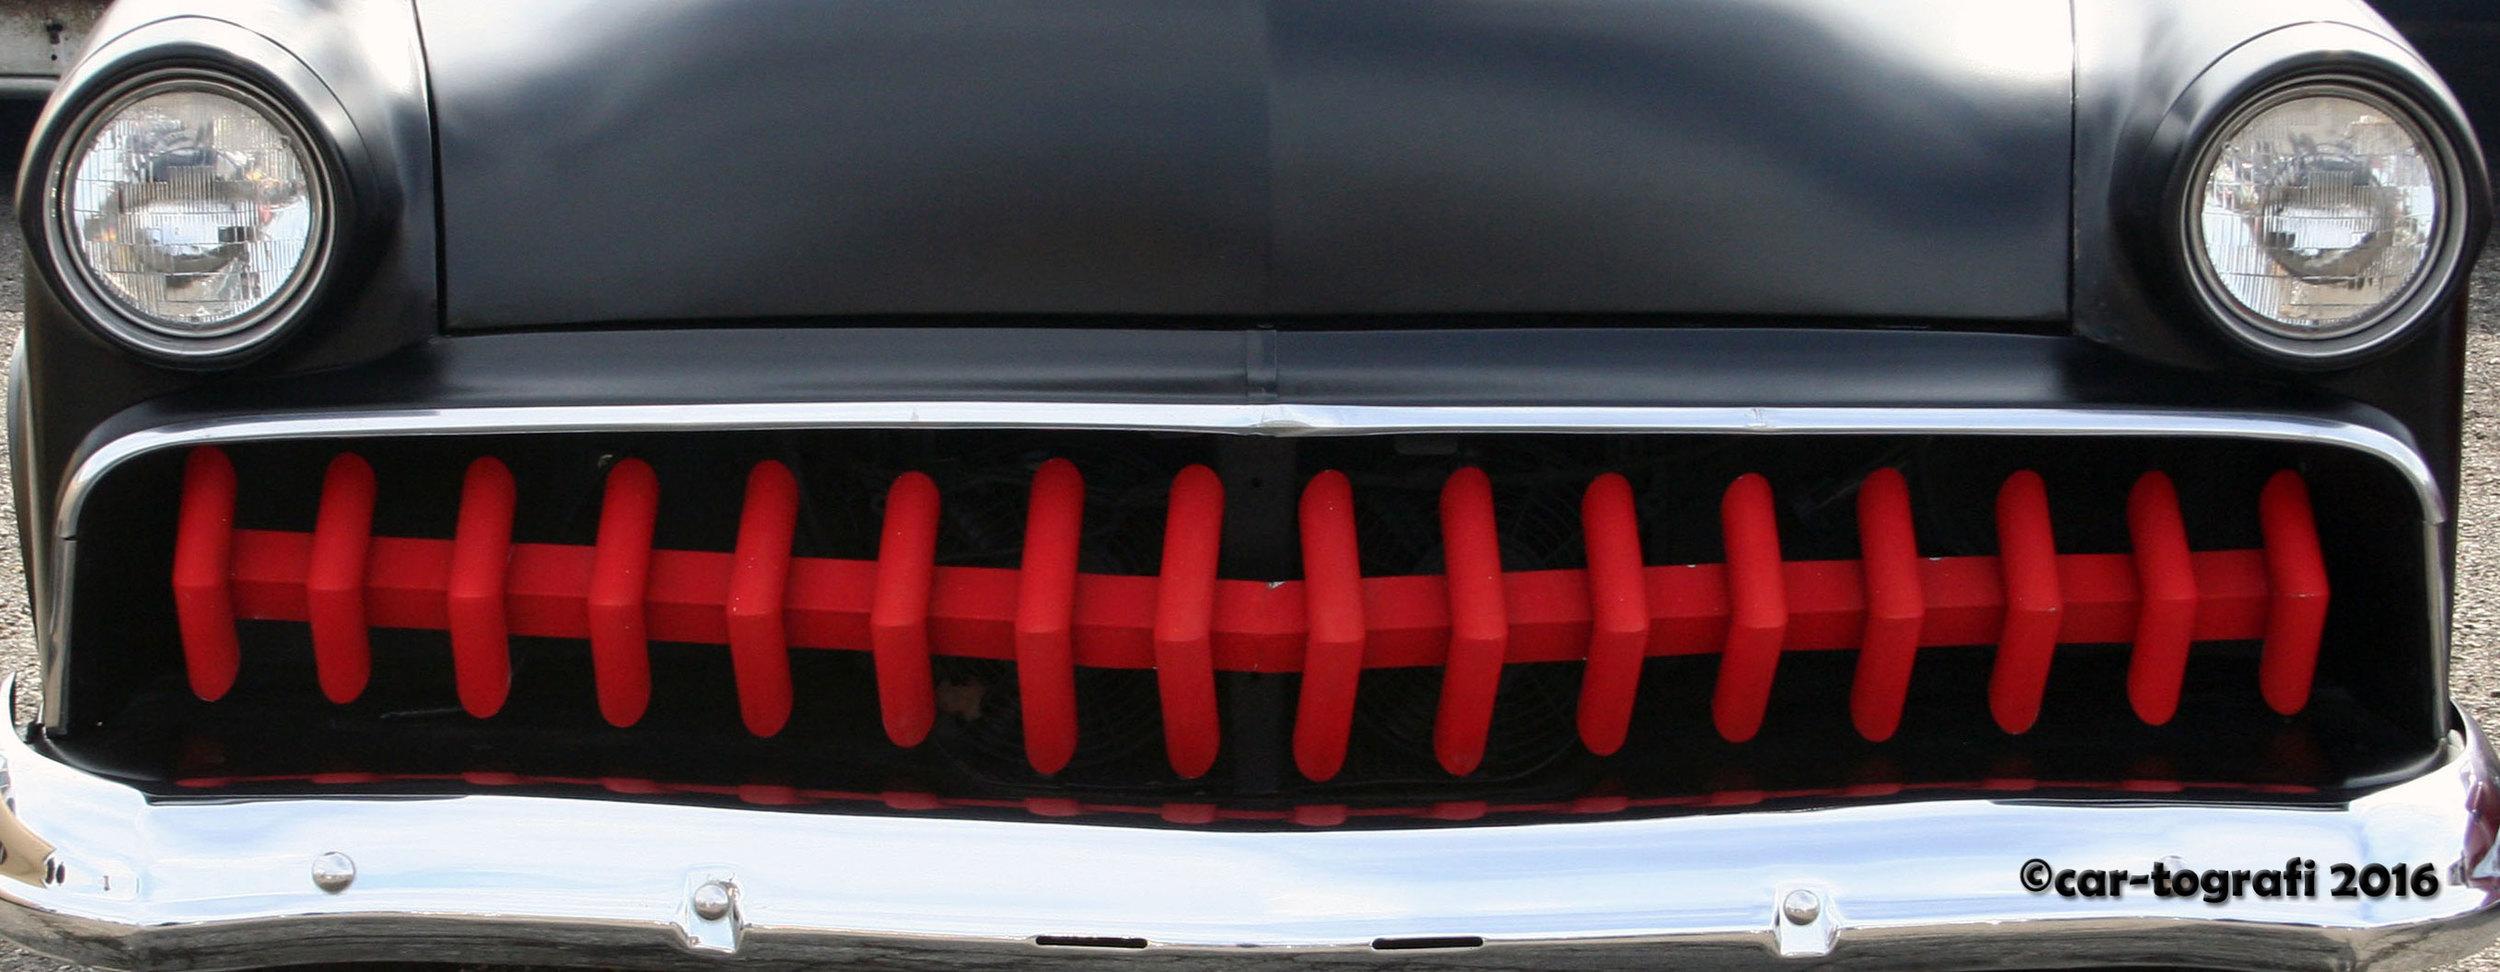 red-teeth-car-tografi.jpg